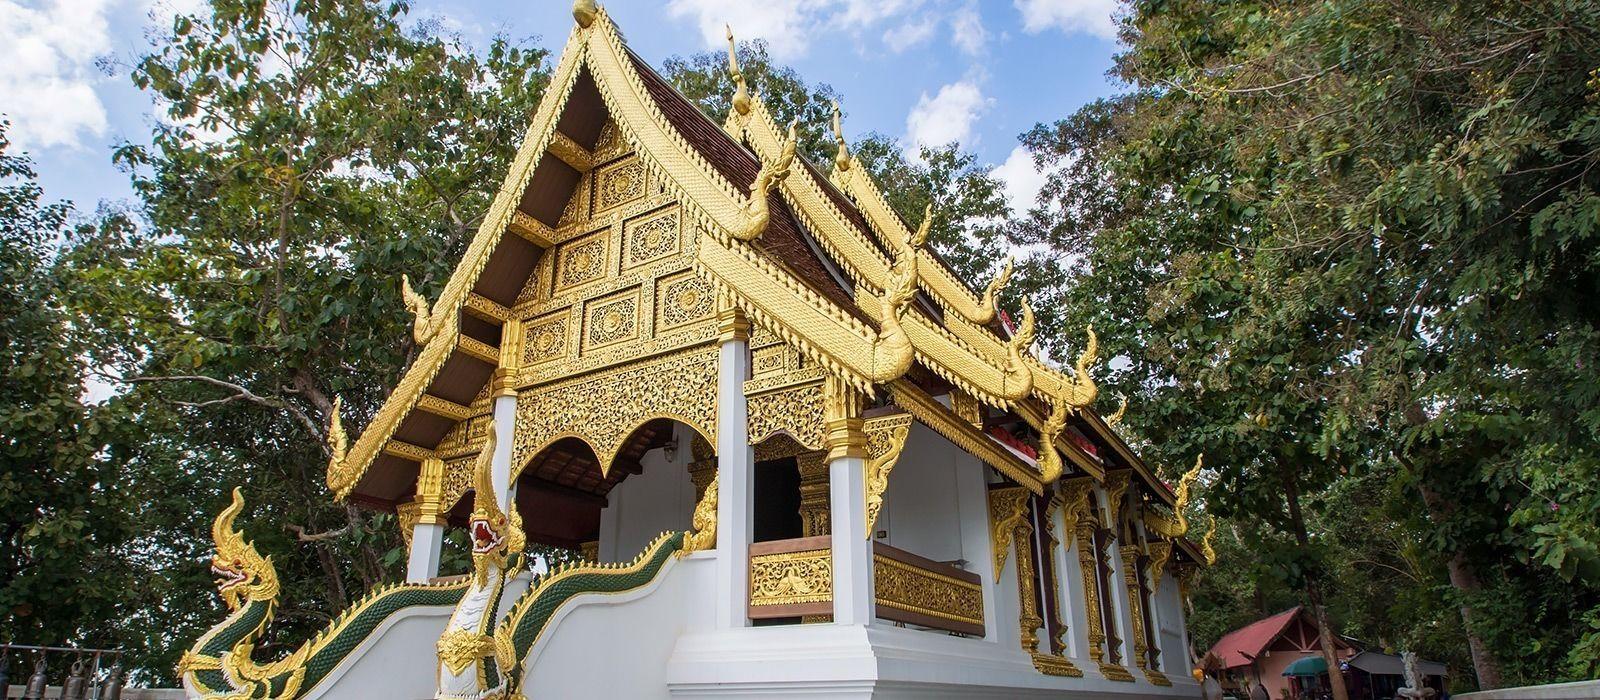 Reiseziel Chiang Saen Thailand